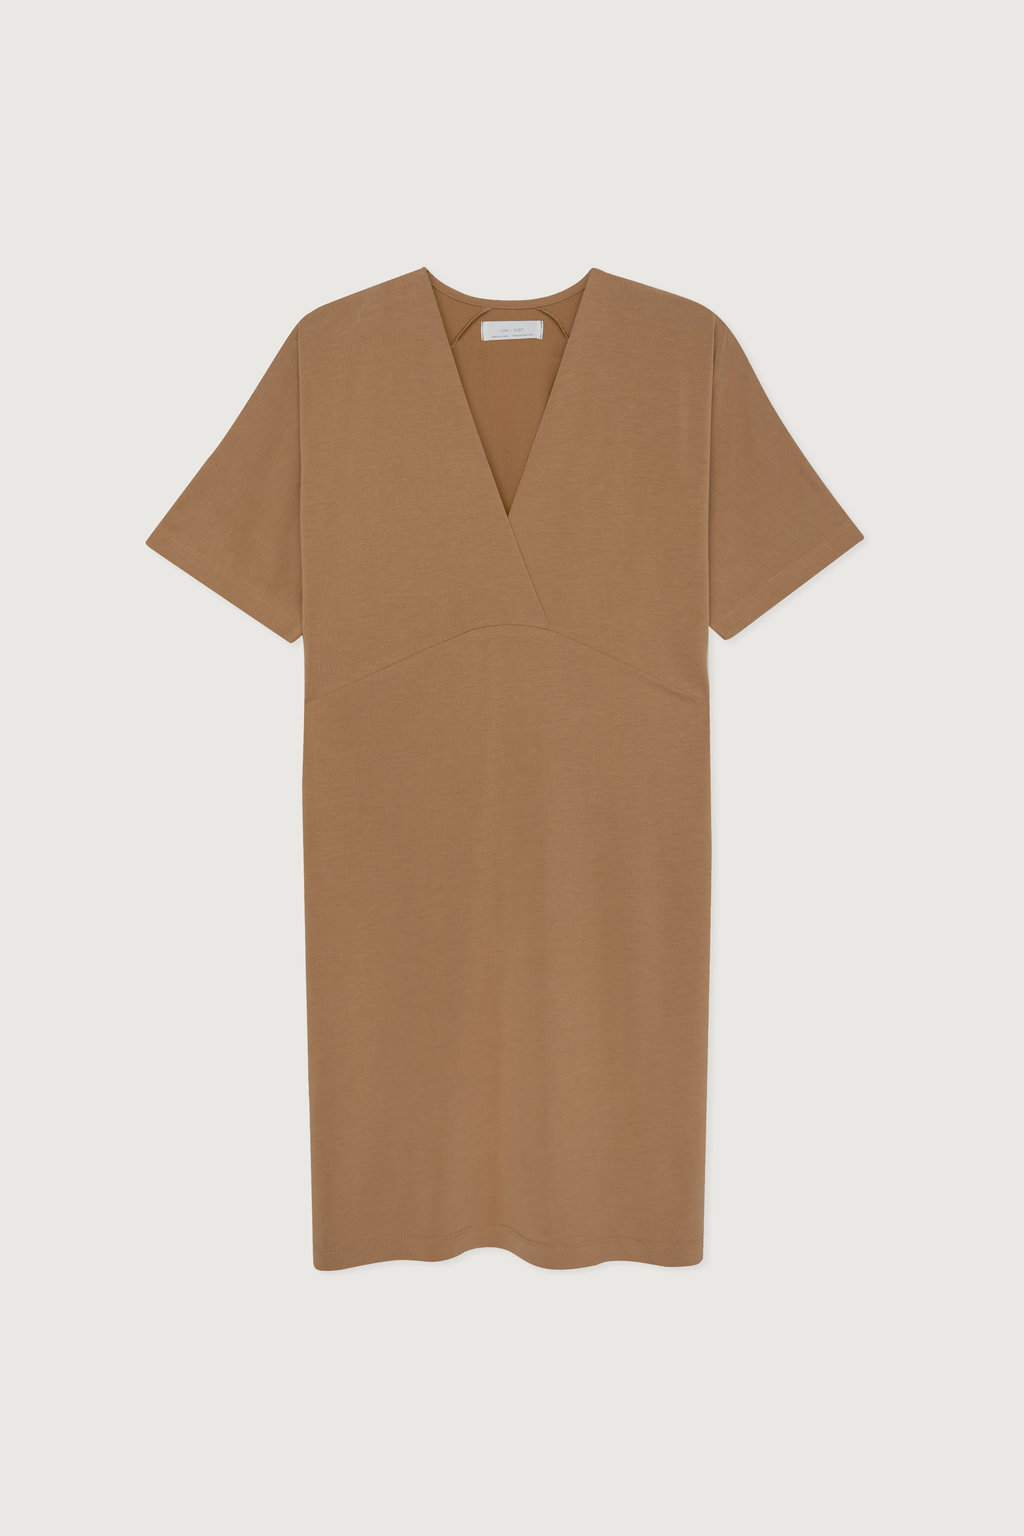 Dress 3157 Tan 9